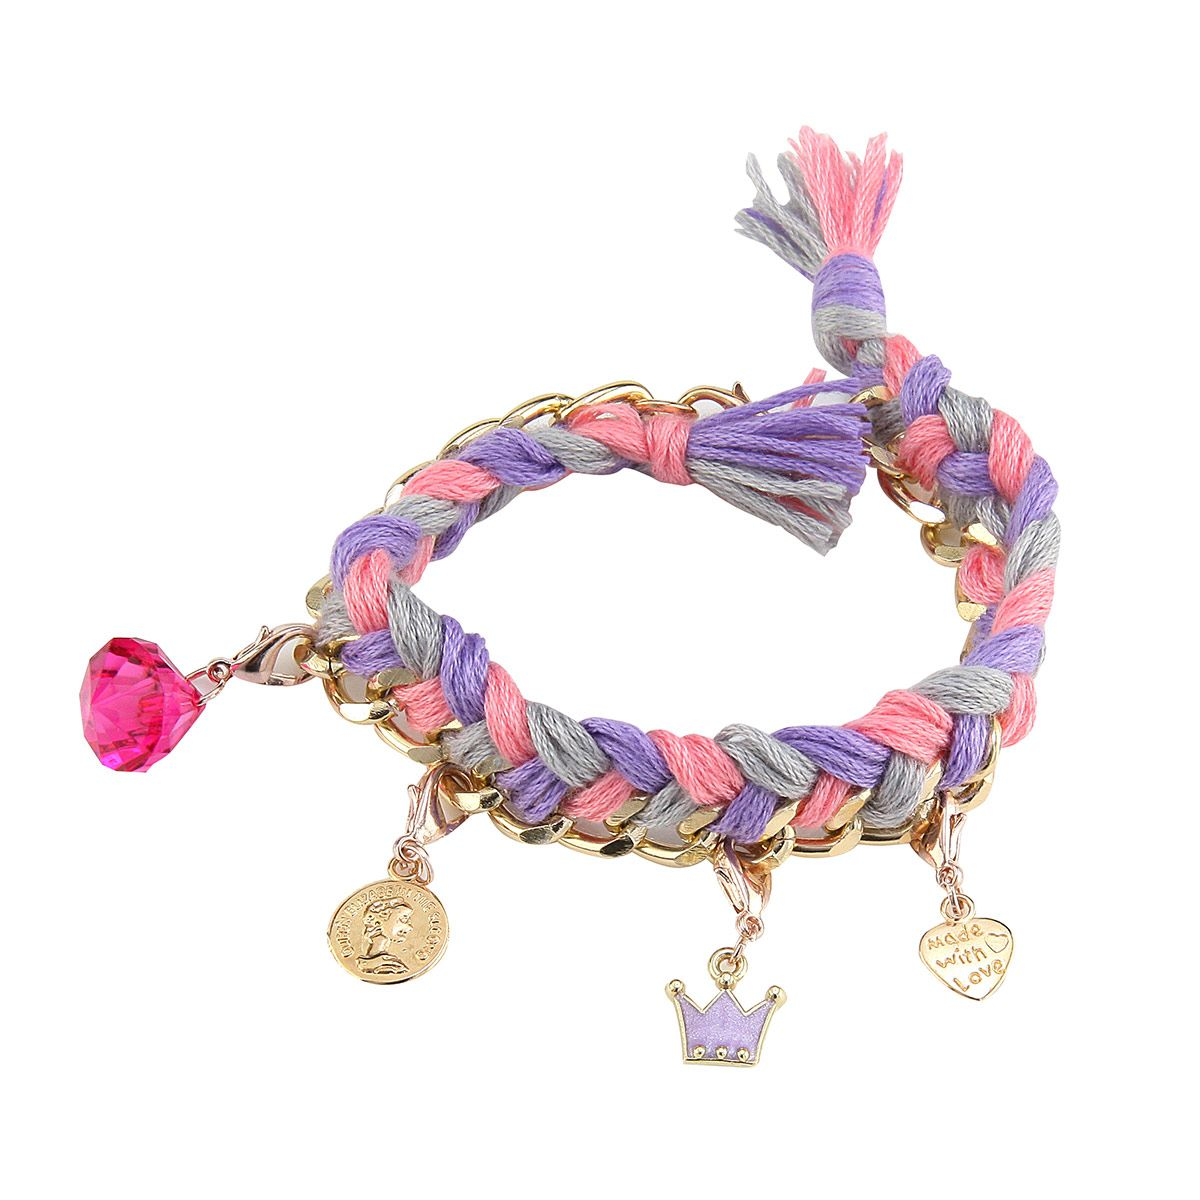 vente discount 2019 real capture CREATION BIJOUX BRELOQUES - Perles, bijoux et perles à ...